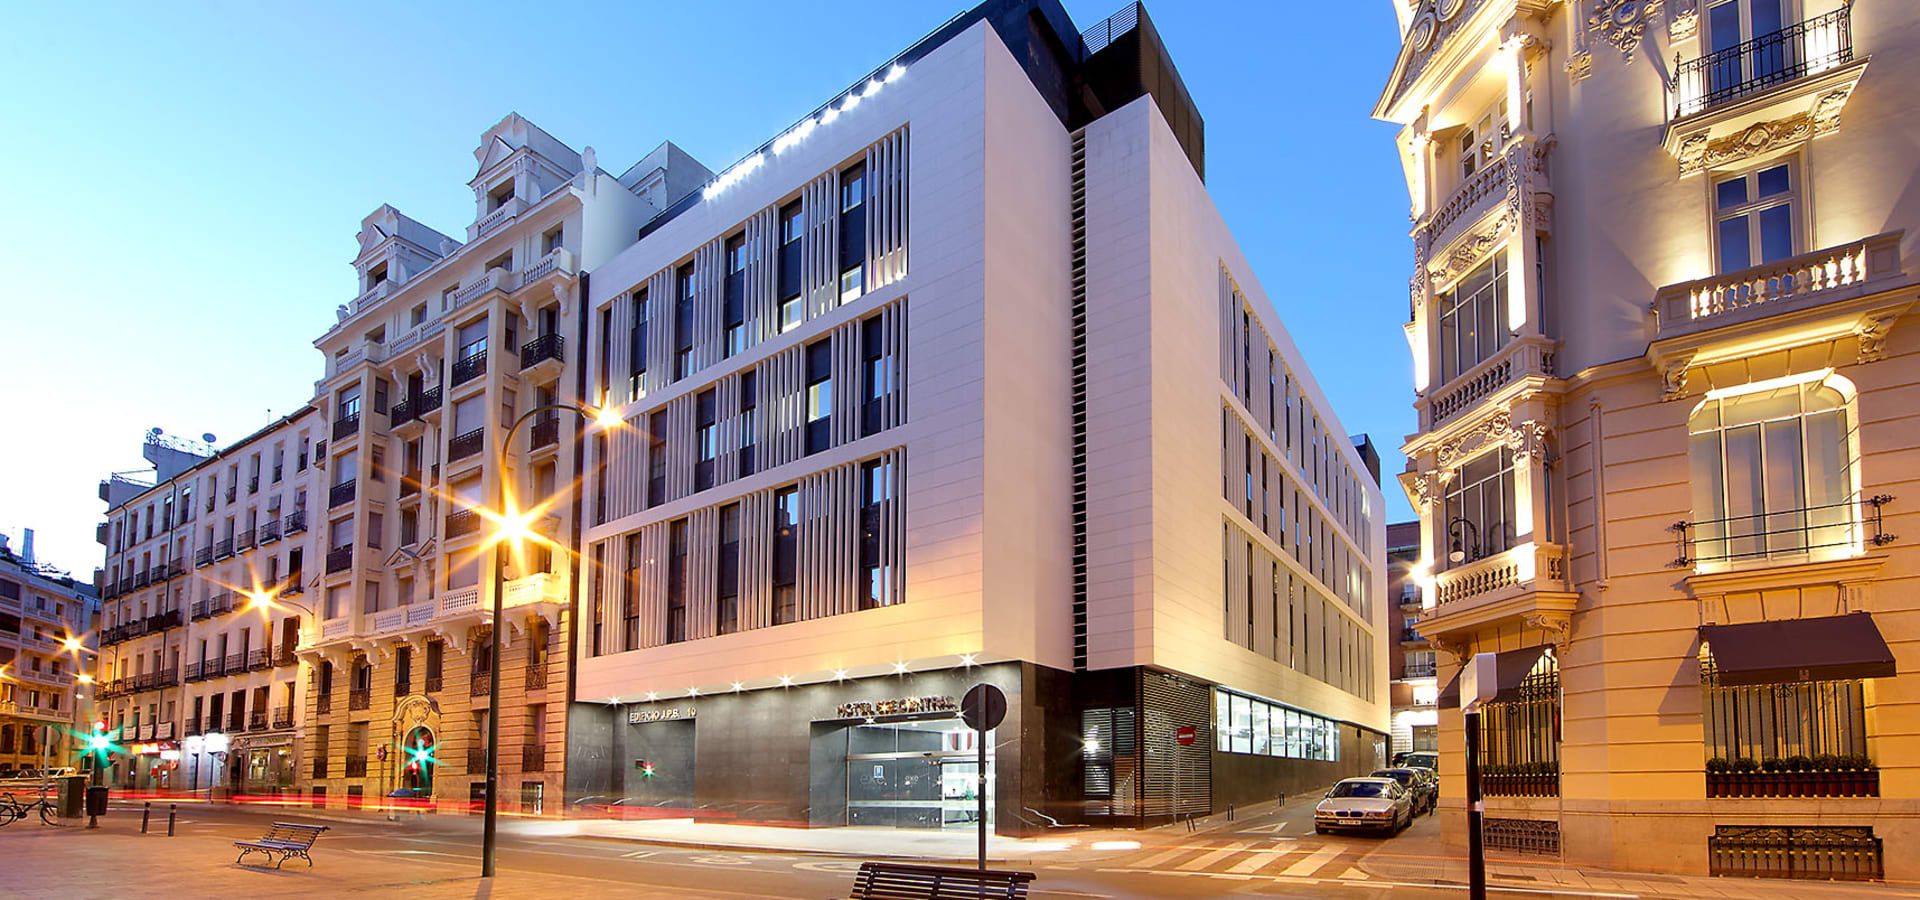 Laboratorio de arquitectura moderna slp arquitectos en for Arquitectos de la arquitectura moderna